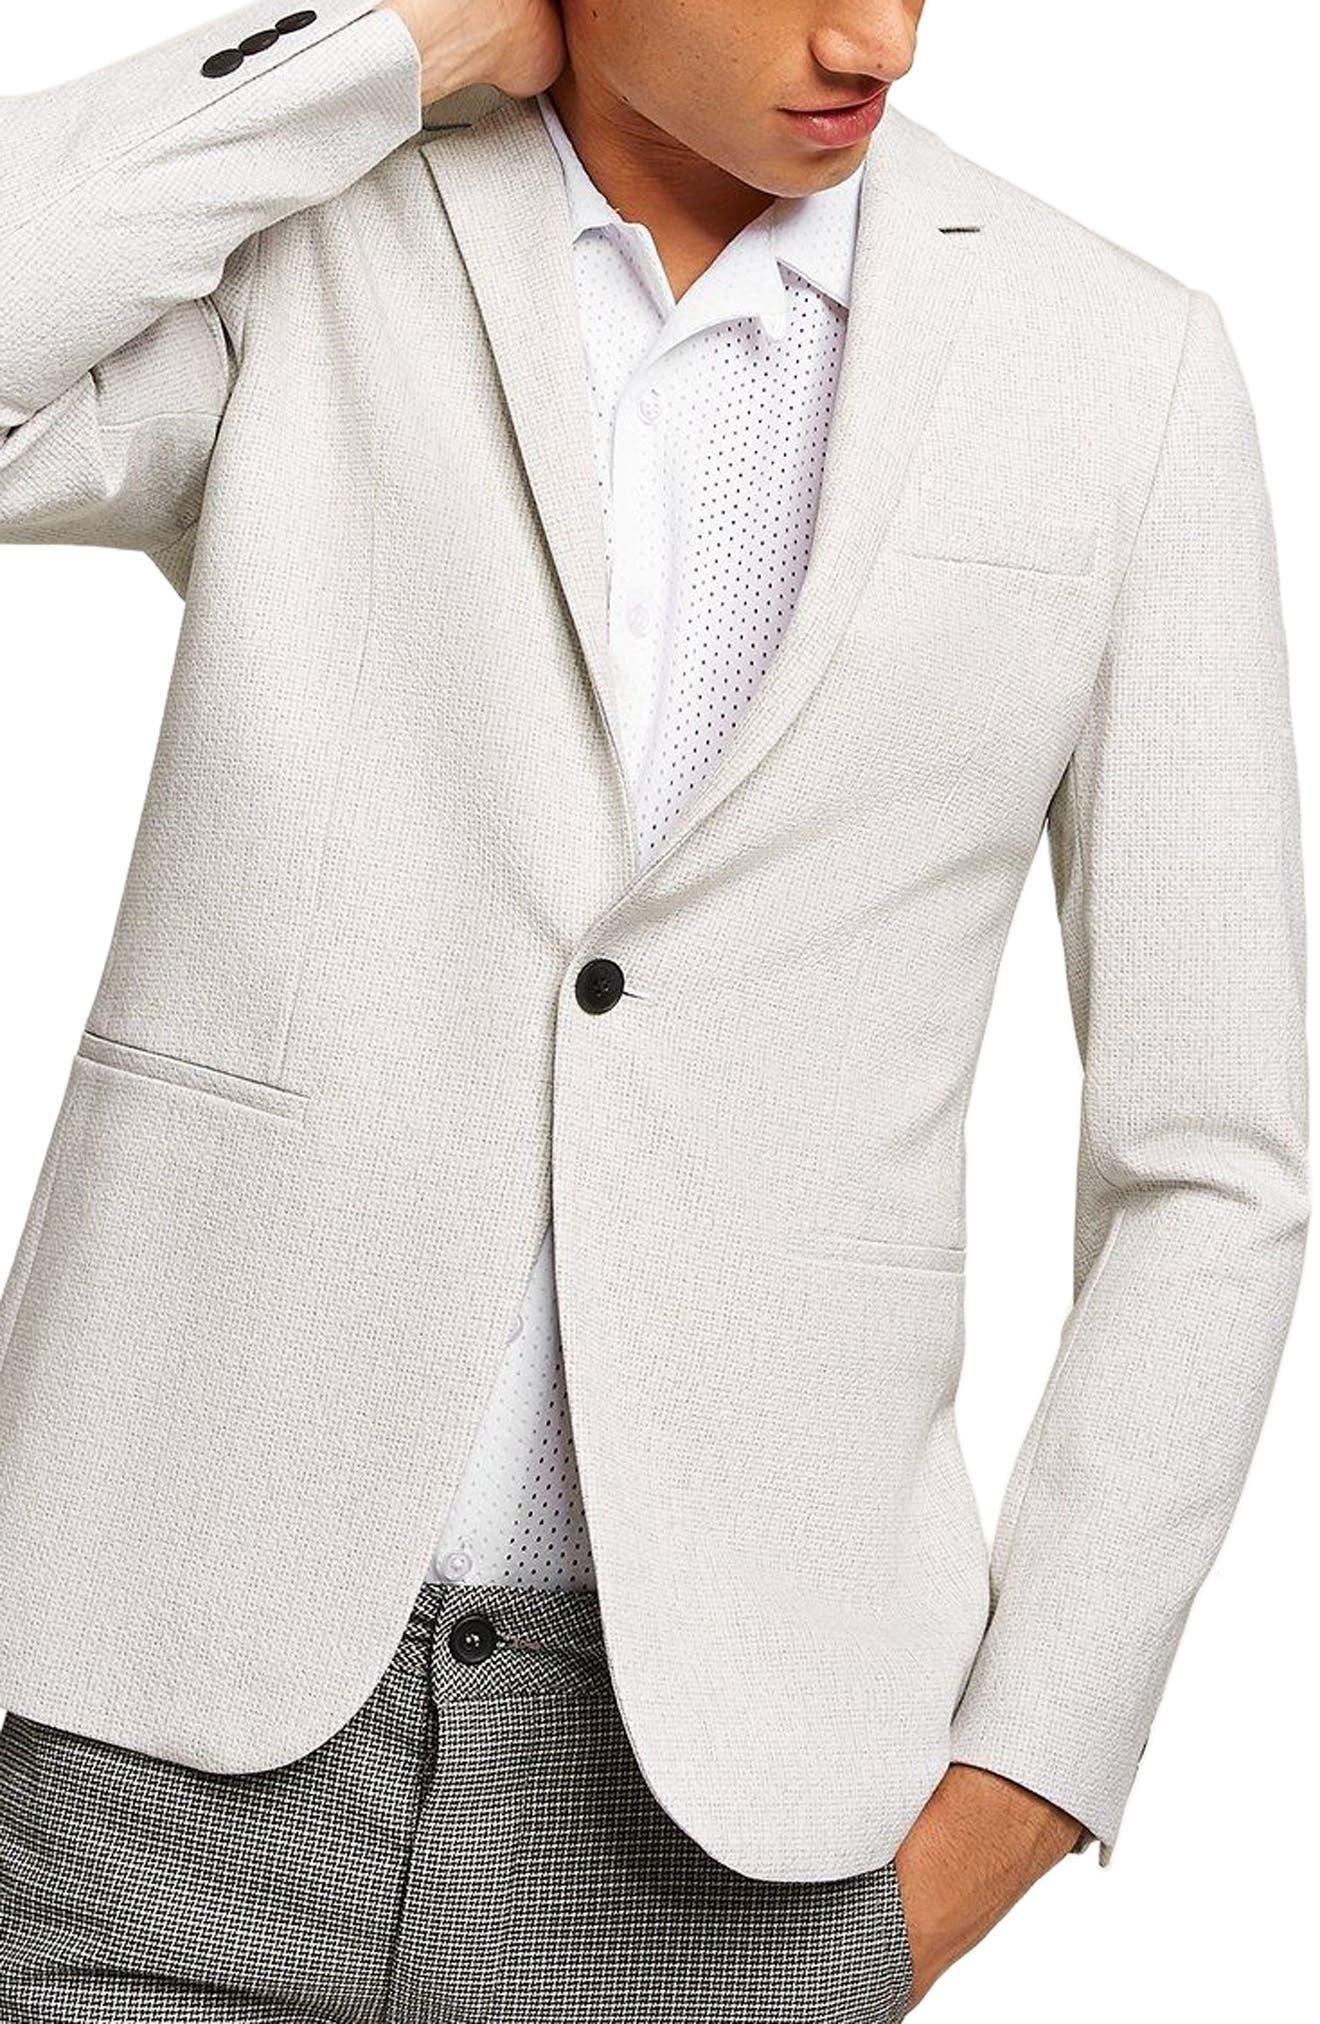 Lionis Skinny Fit Textured Sport Coat,                         Main,                         color, LIGHT GREY